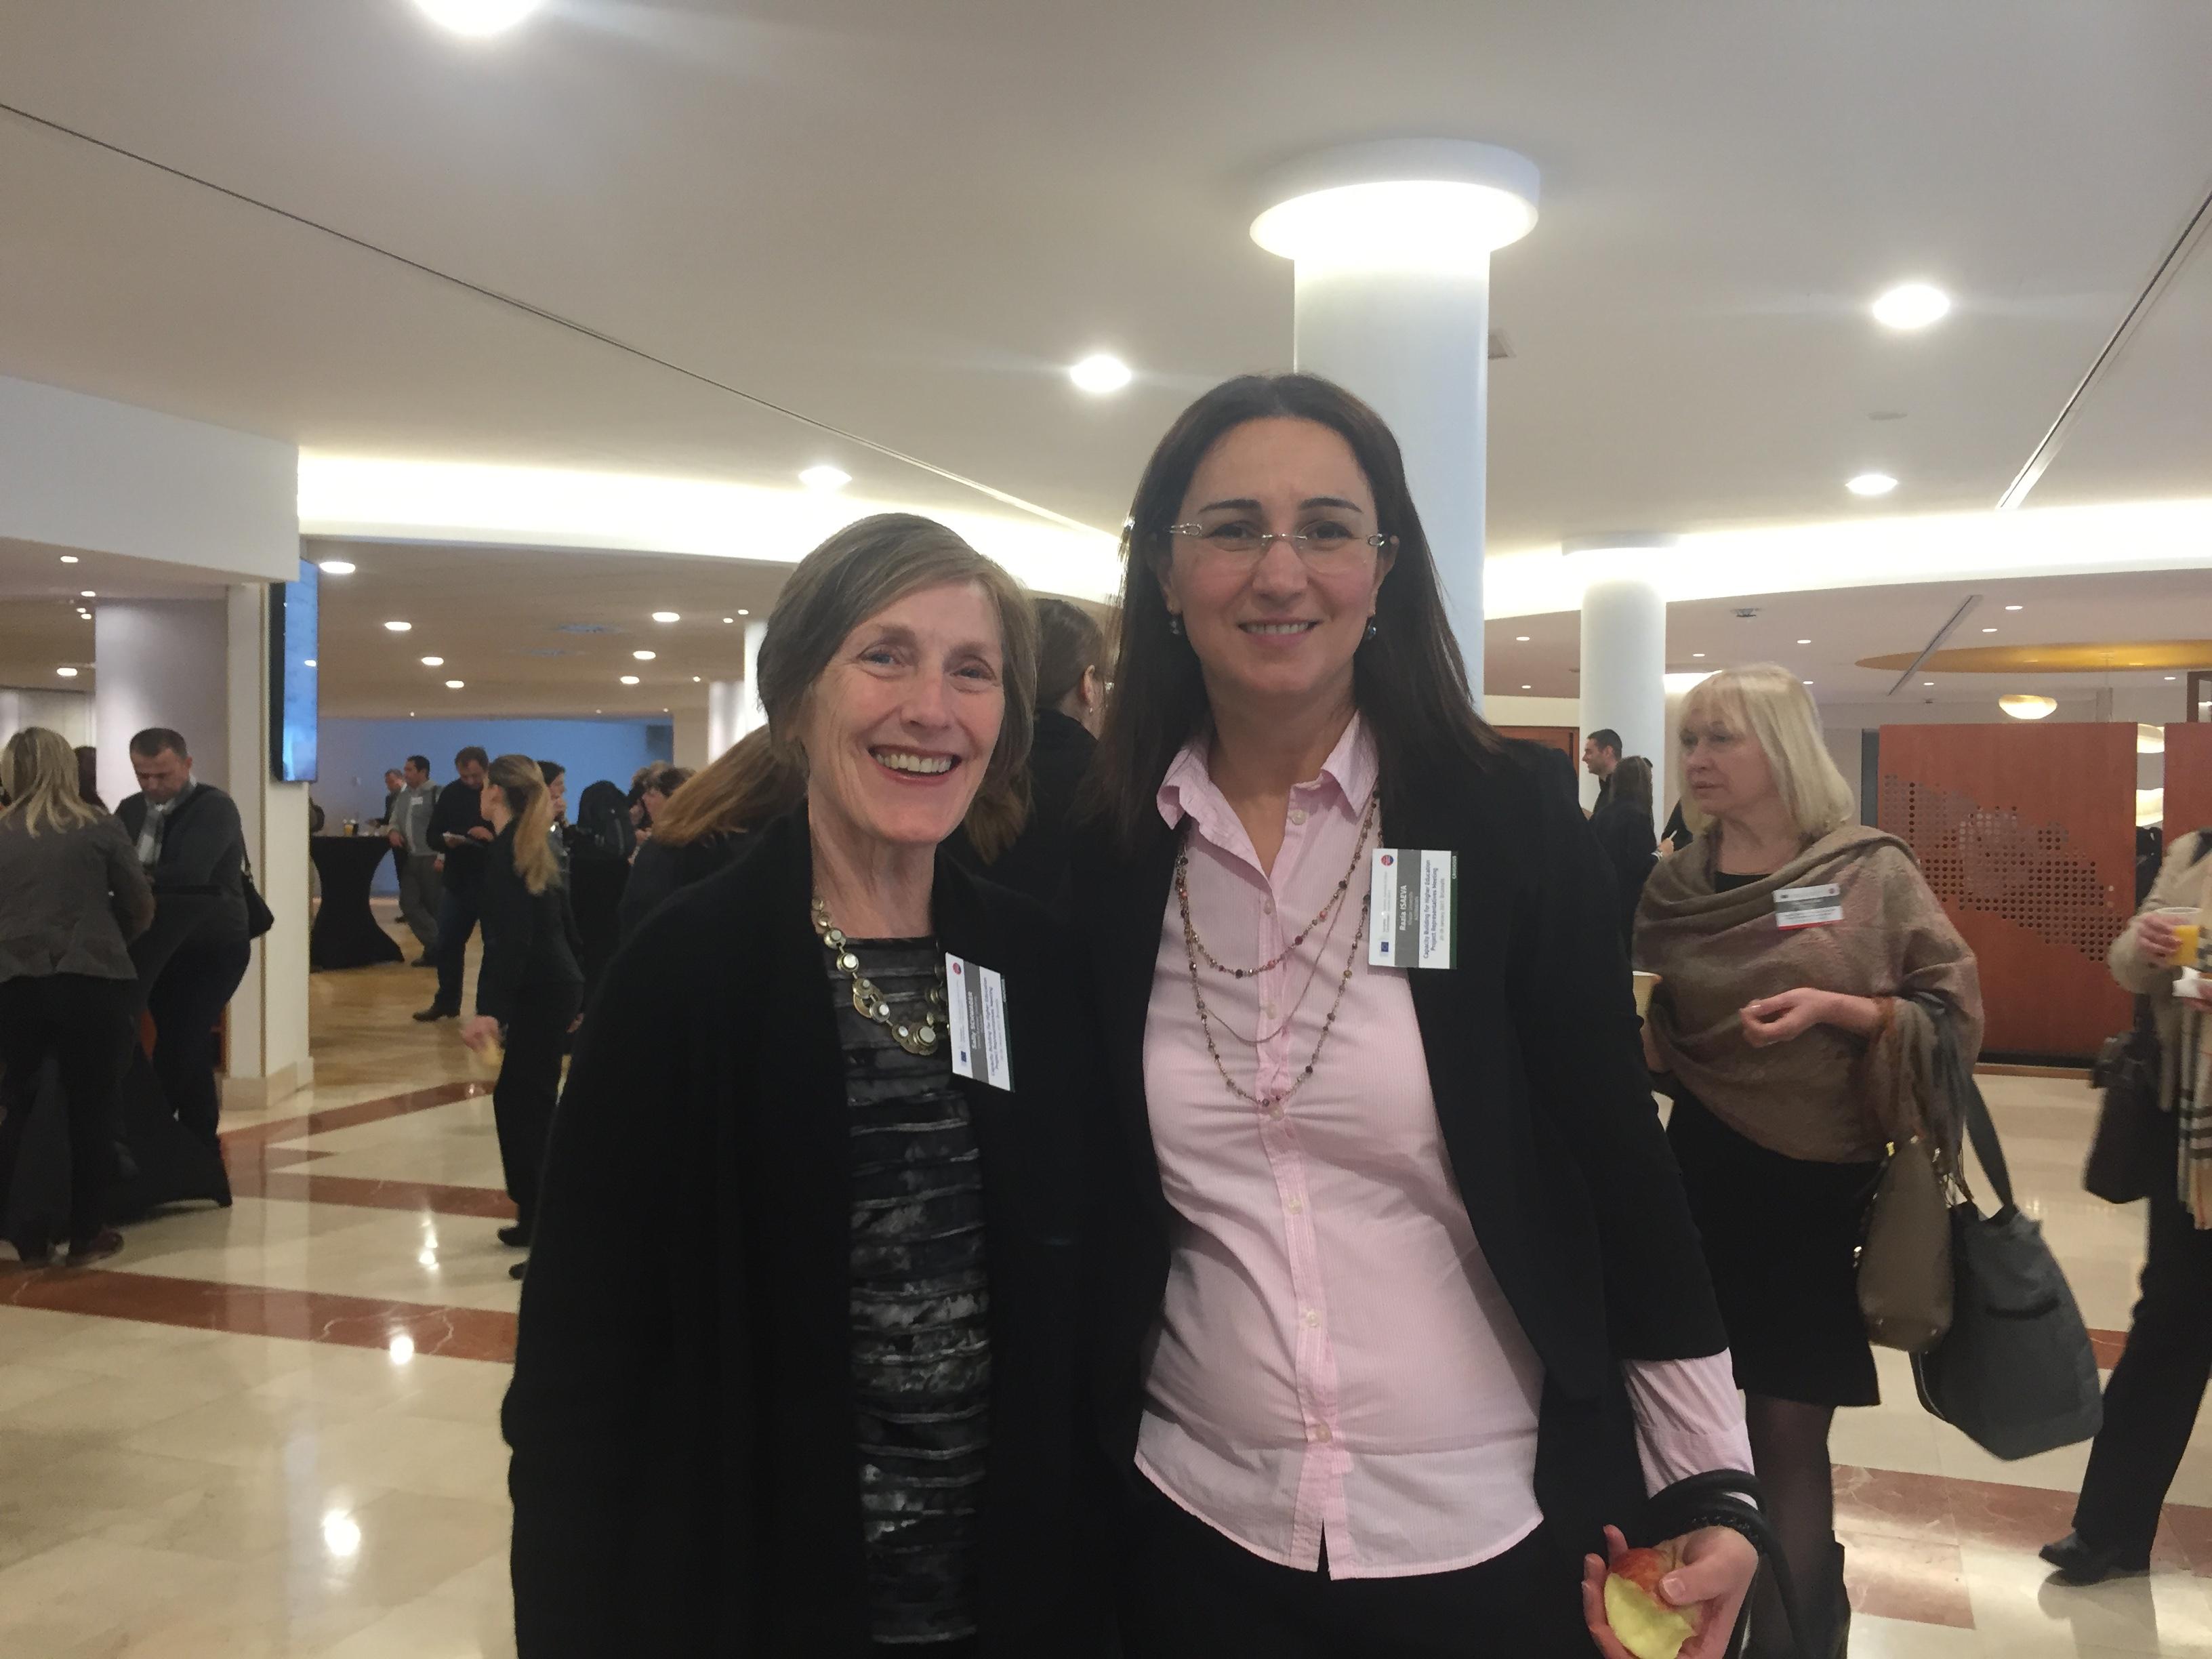 Grant Holders' Annual Meeting in Brussels